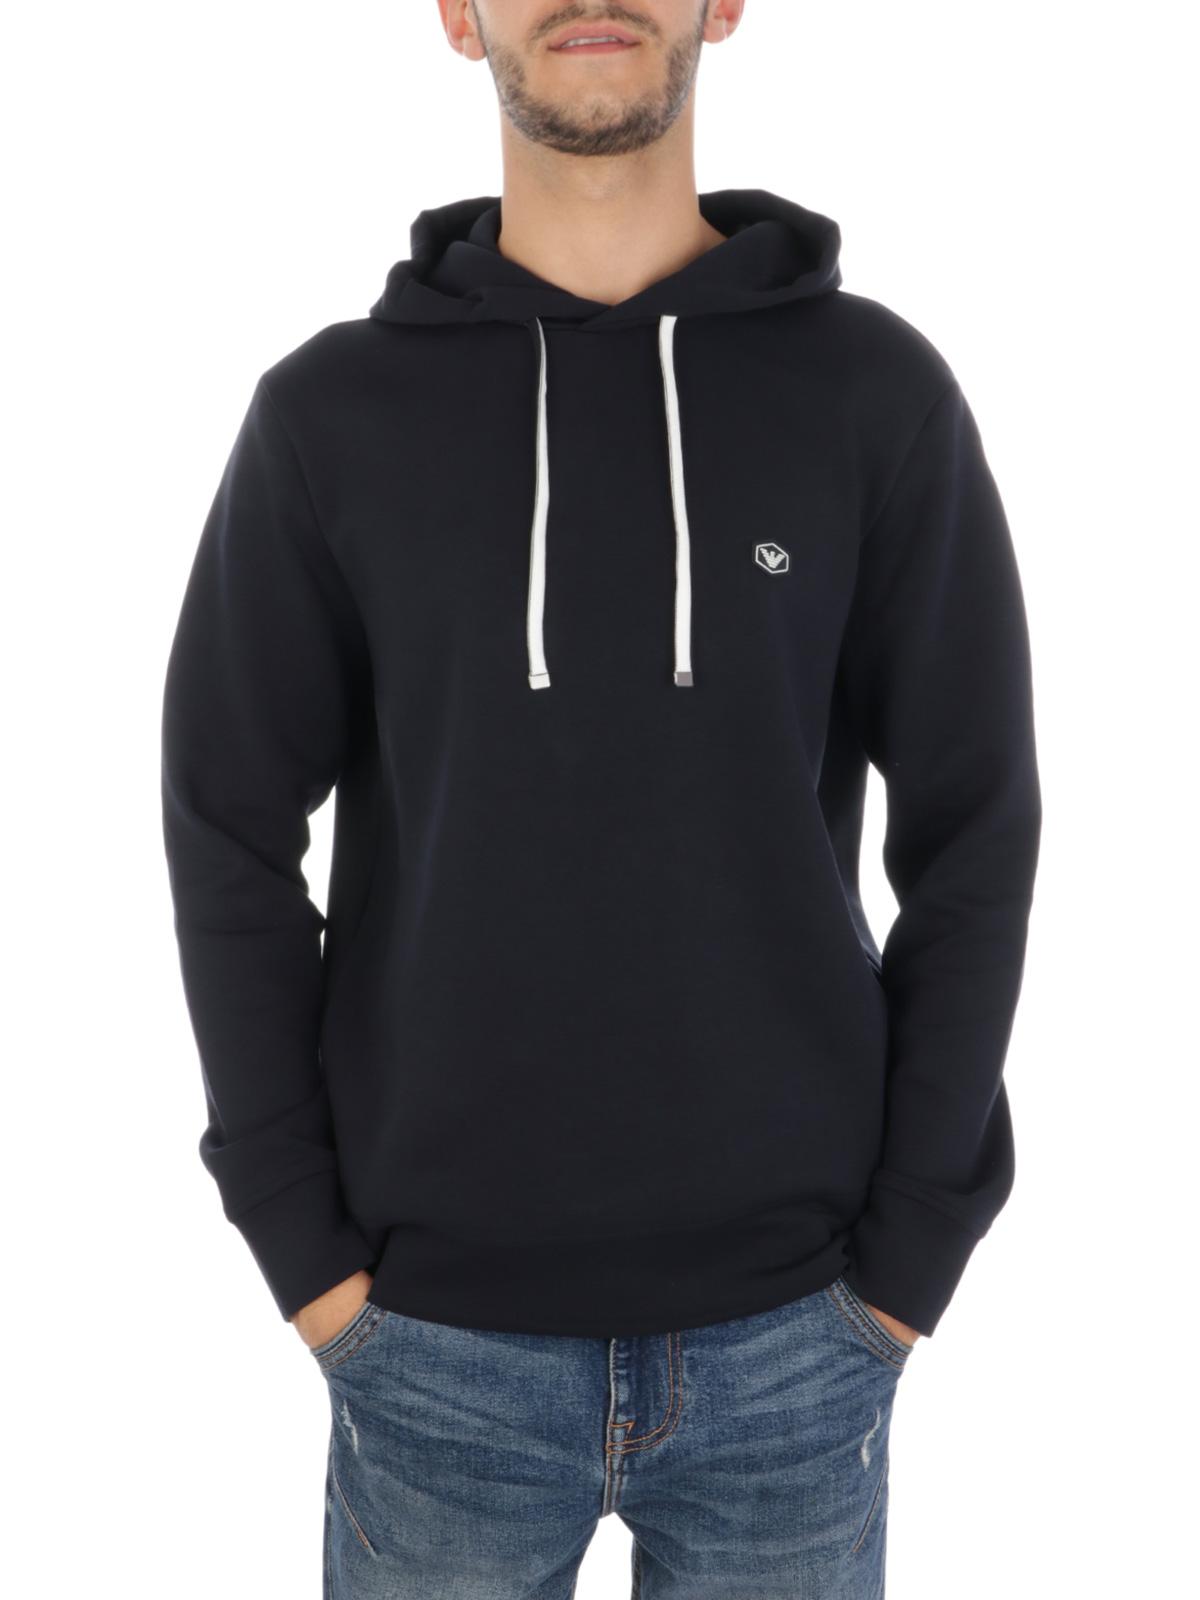 Picture of EMPORIO ARMANI   Men's Stretch Hooded Sweatshirt